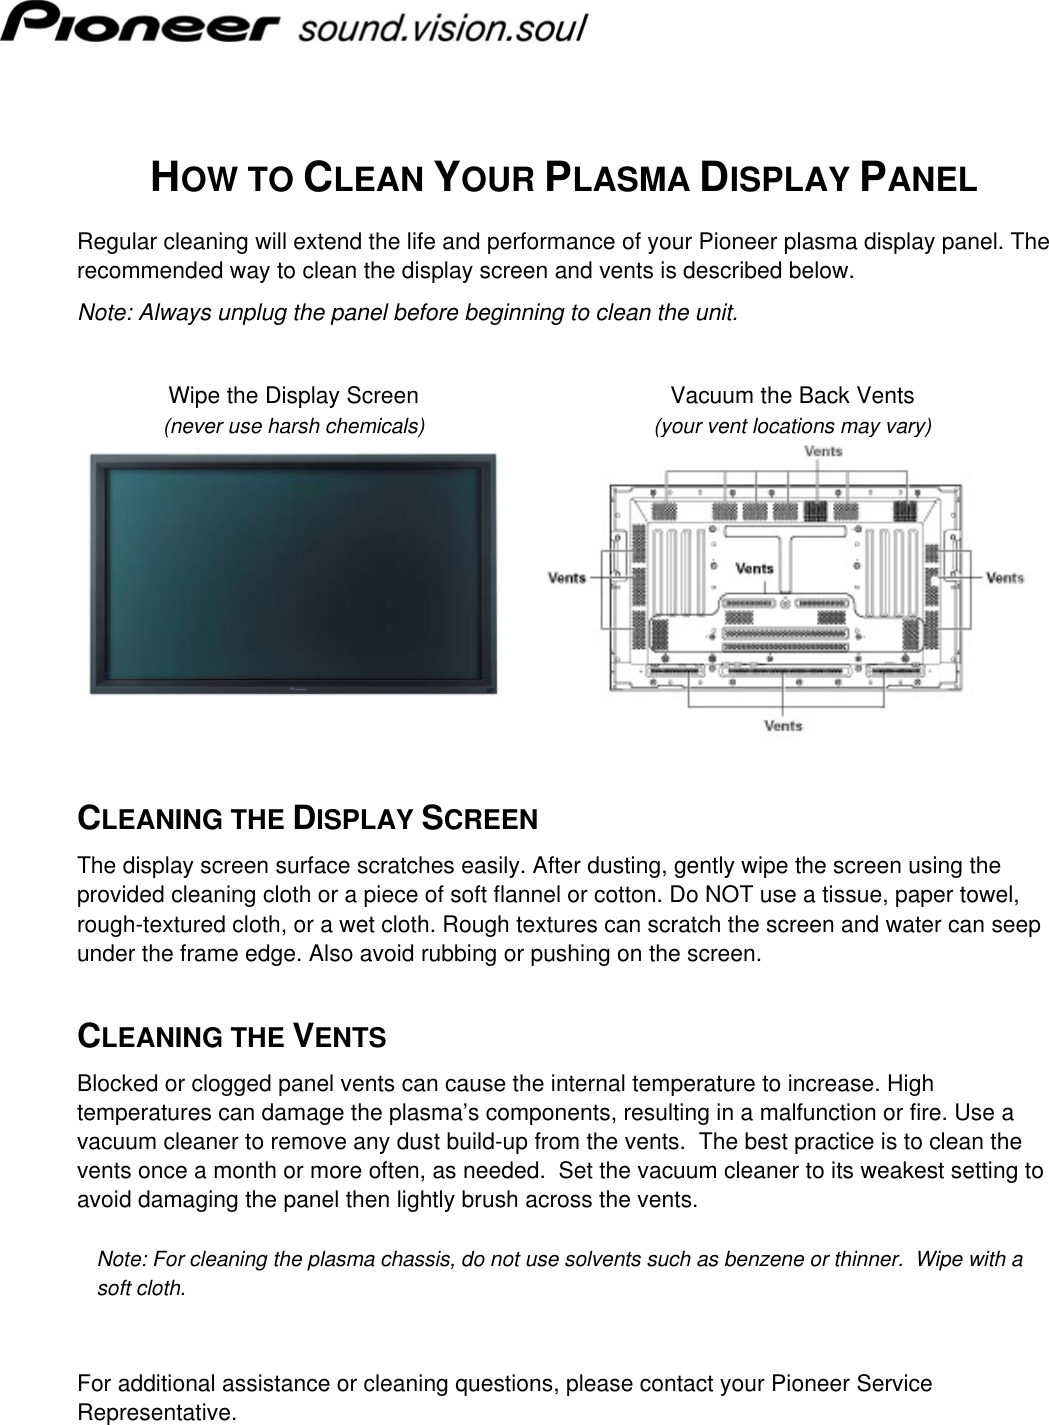 pioneer plasma display panel users manual how to clean the screen rh usermanual wiki Pioneer Plasma HDMI Connection Pioneer Plasma HDMI Connection